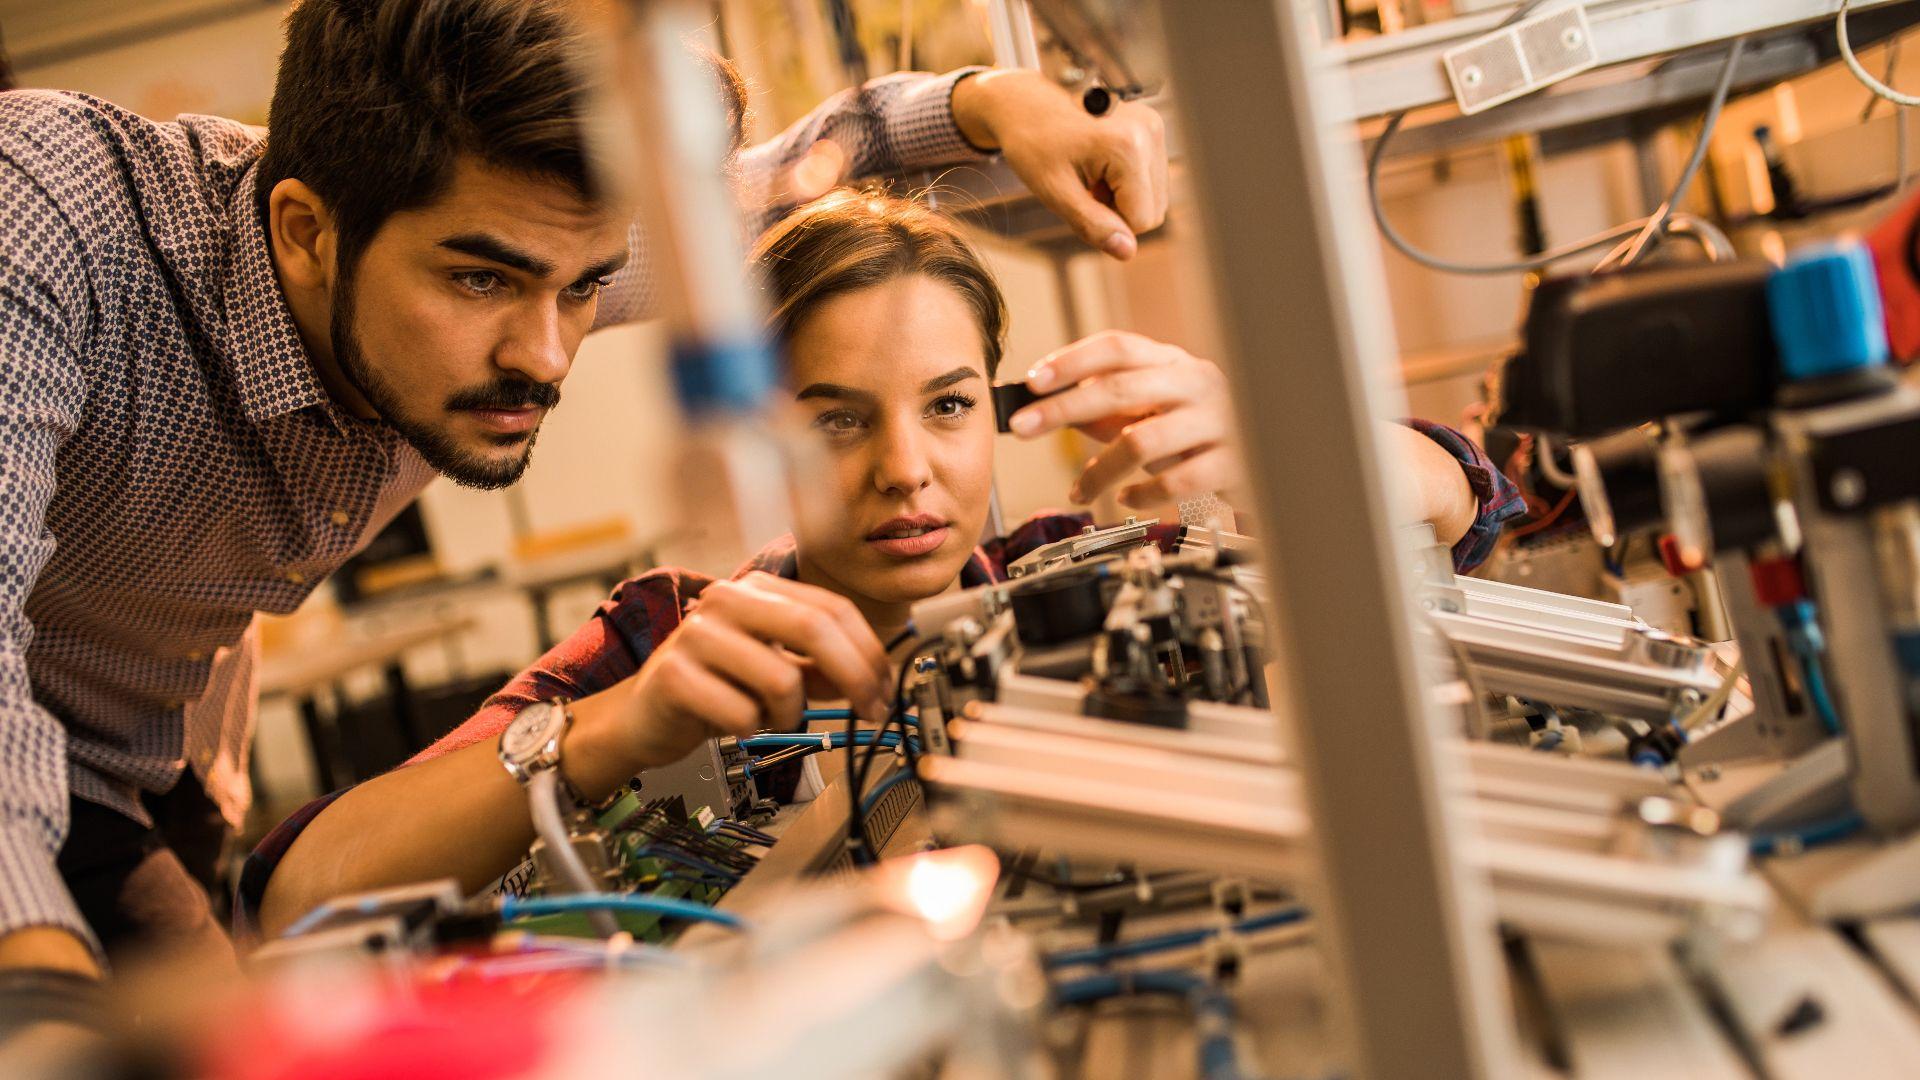 Charles Sturt academics to deliver online content for STEM 2020 On Demand